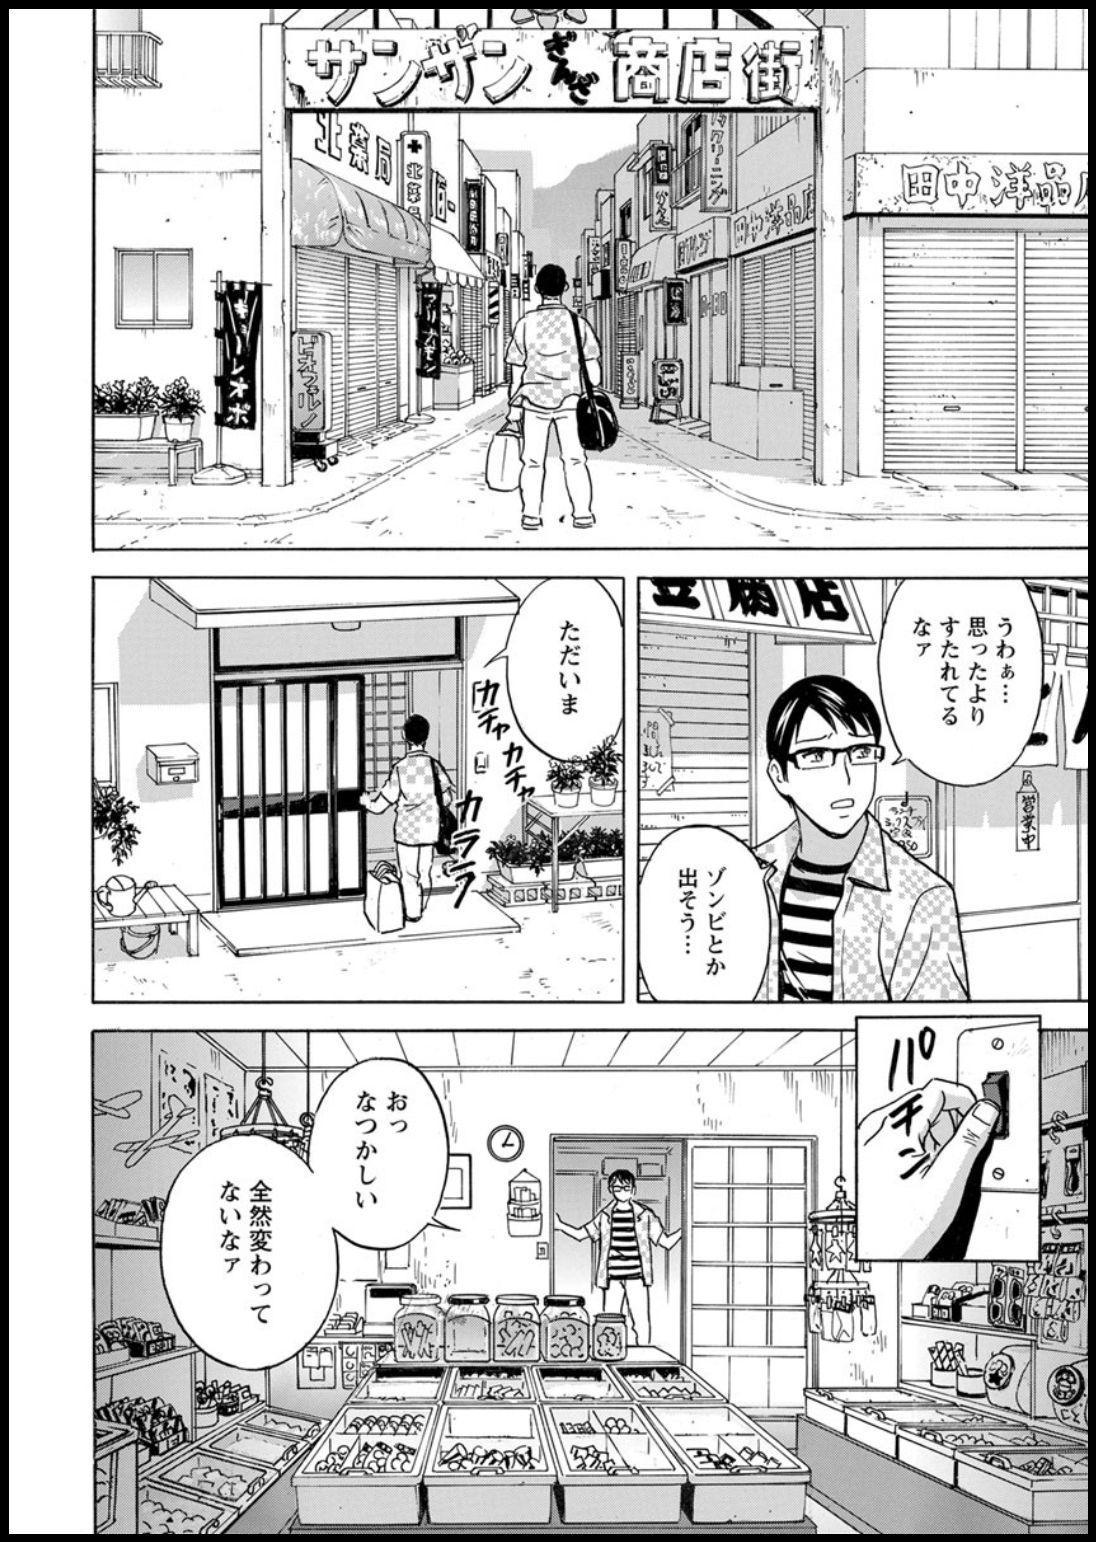 [Hidemaru] Yurase Bikyonyuu! Hataraku J-Cup Ch. 1-5 [Digital] 5